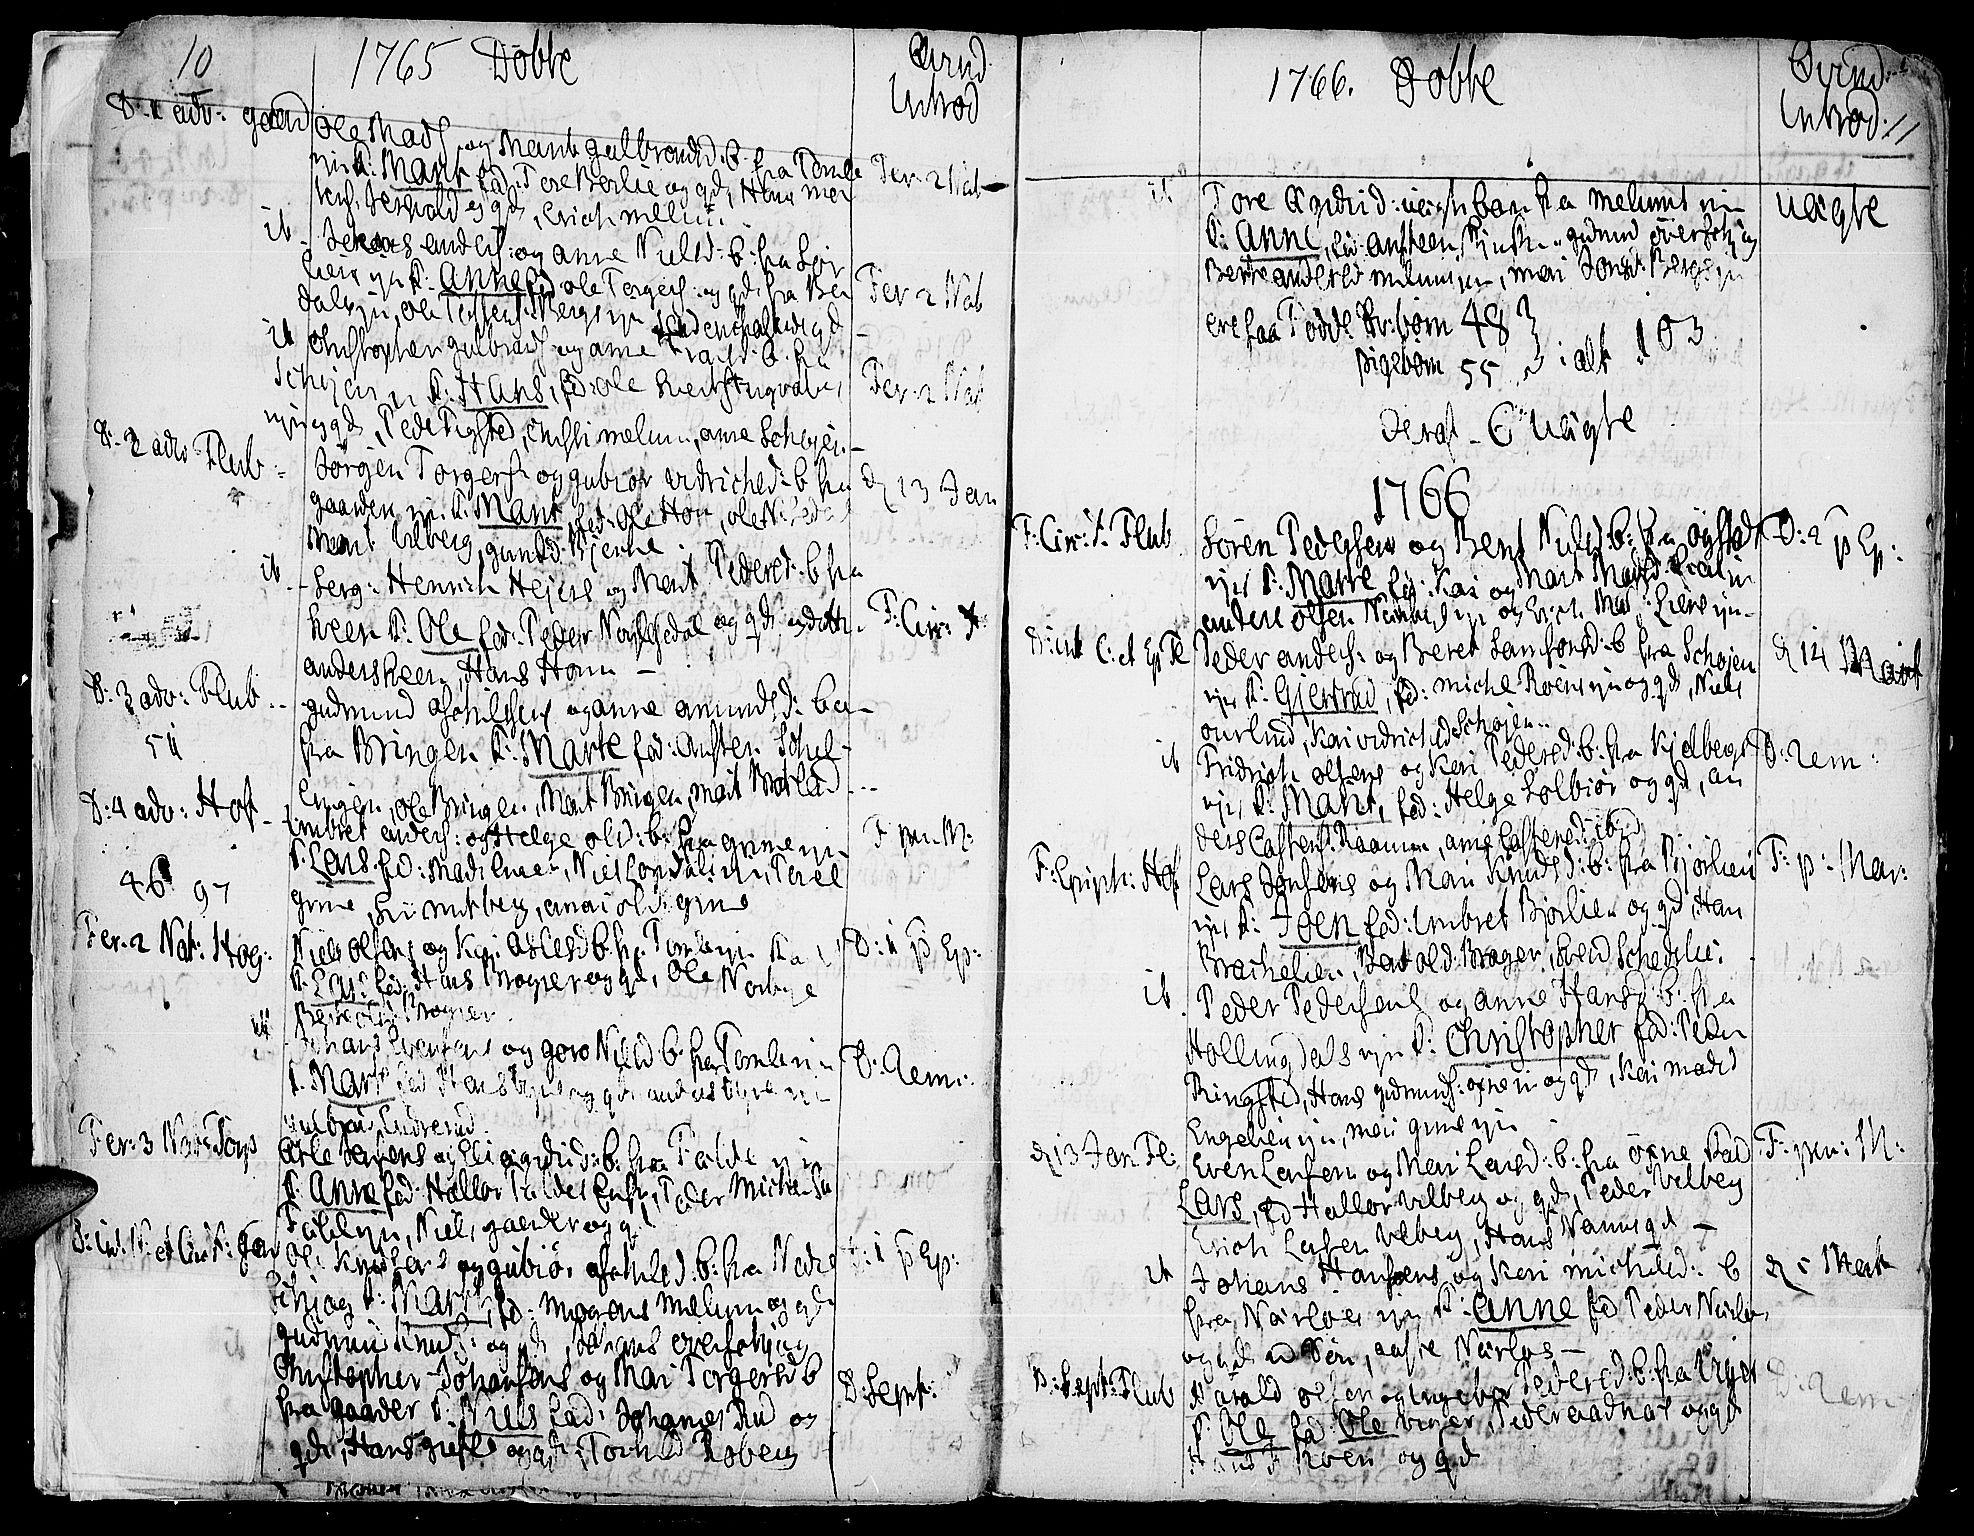 SAH, Land prestekontor, Ministerialbok nr. 5, 1765-1784, s. 10-11